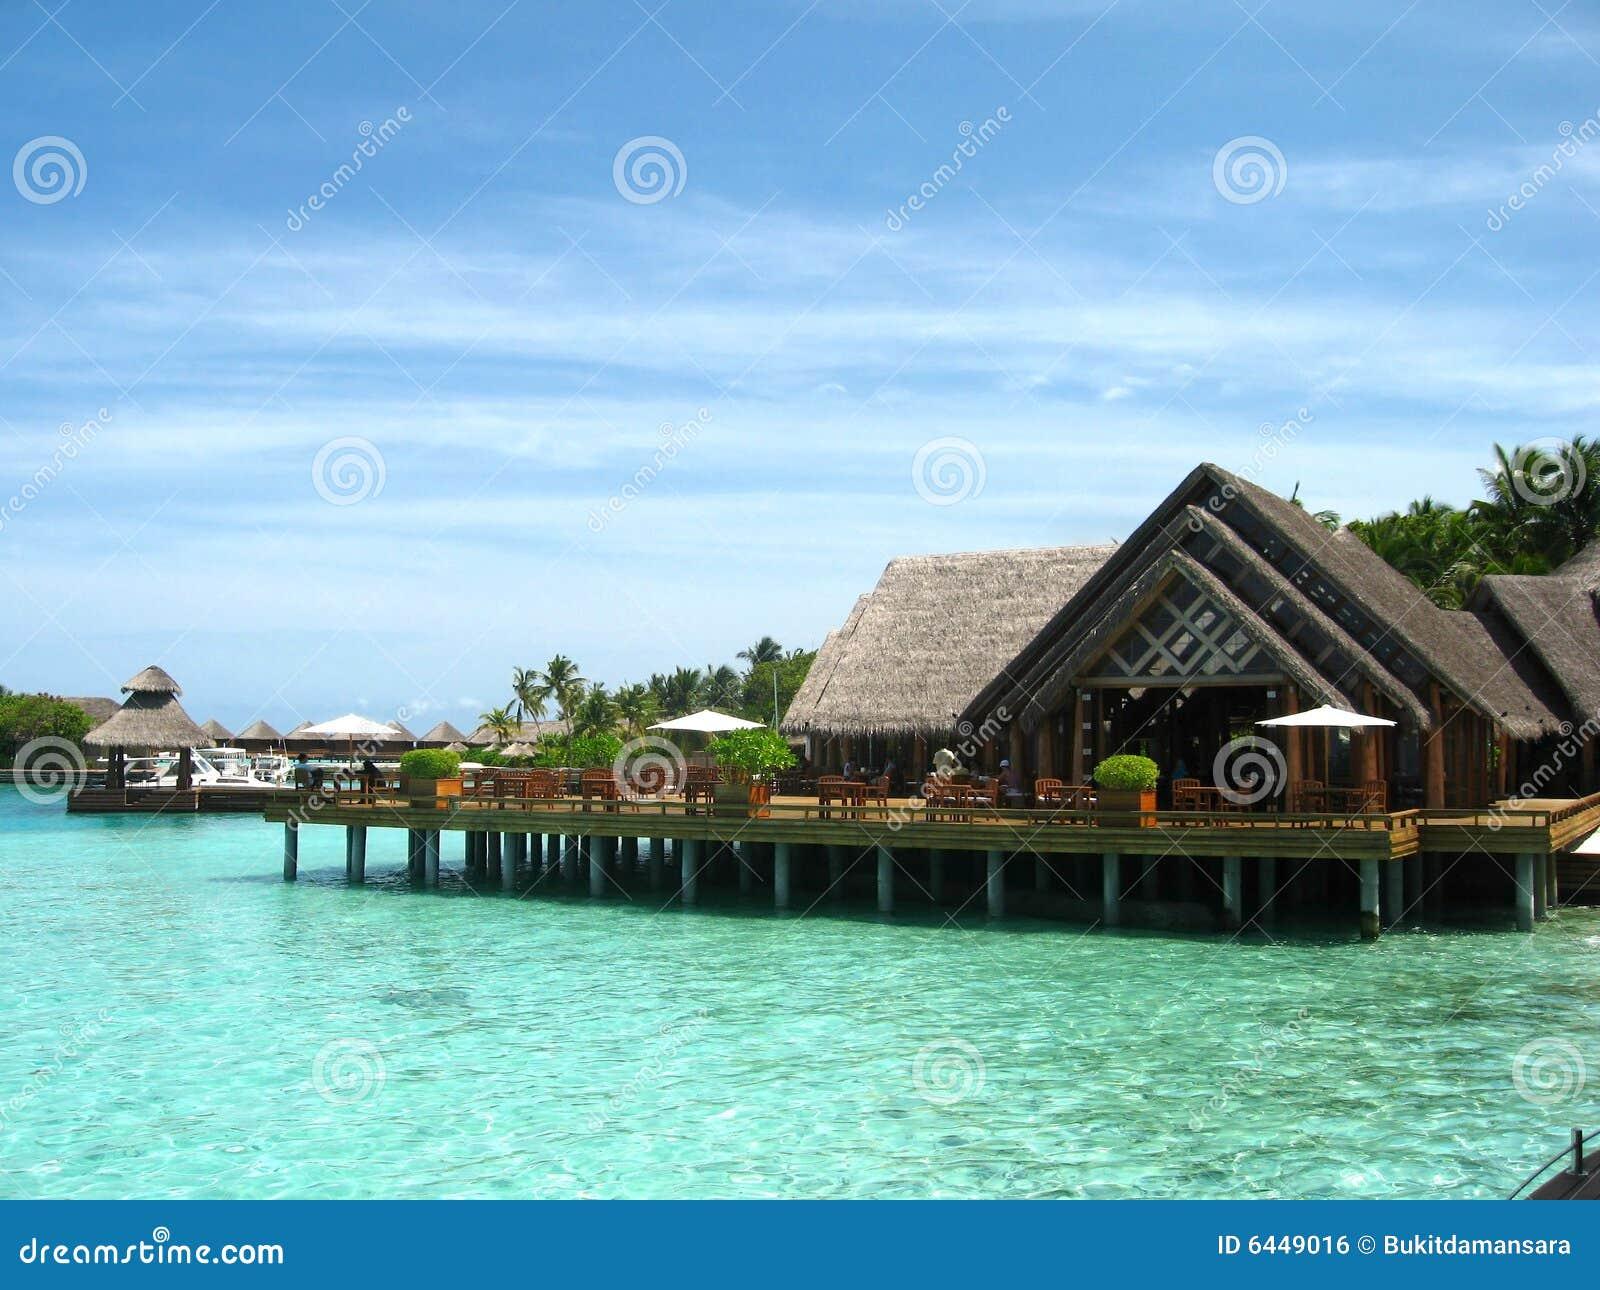 insel strand haus in maldives stockfoto bild von k ste. Black Bedroom Furniture Sets. Home Design Ideas